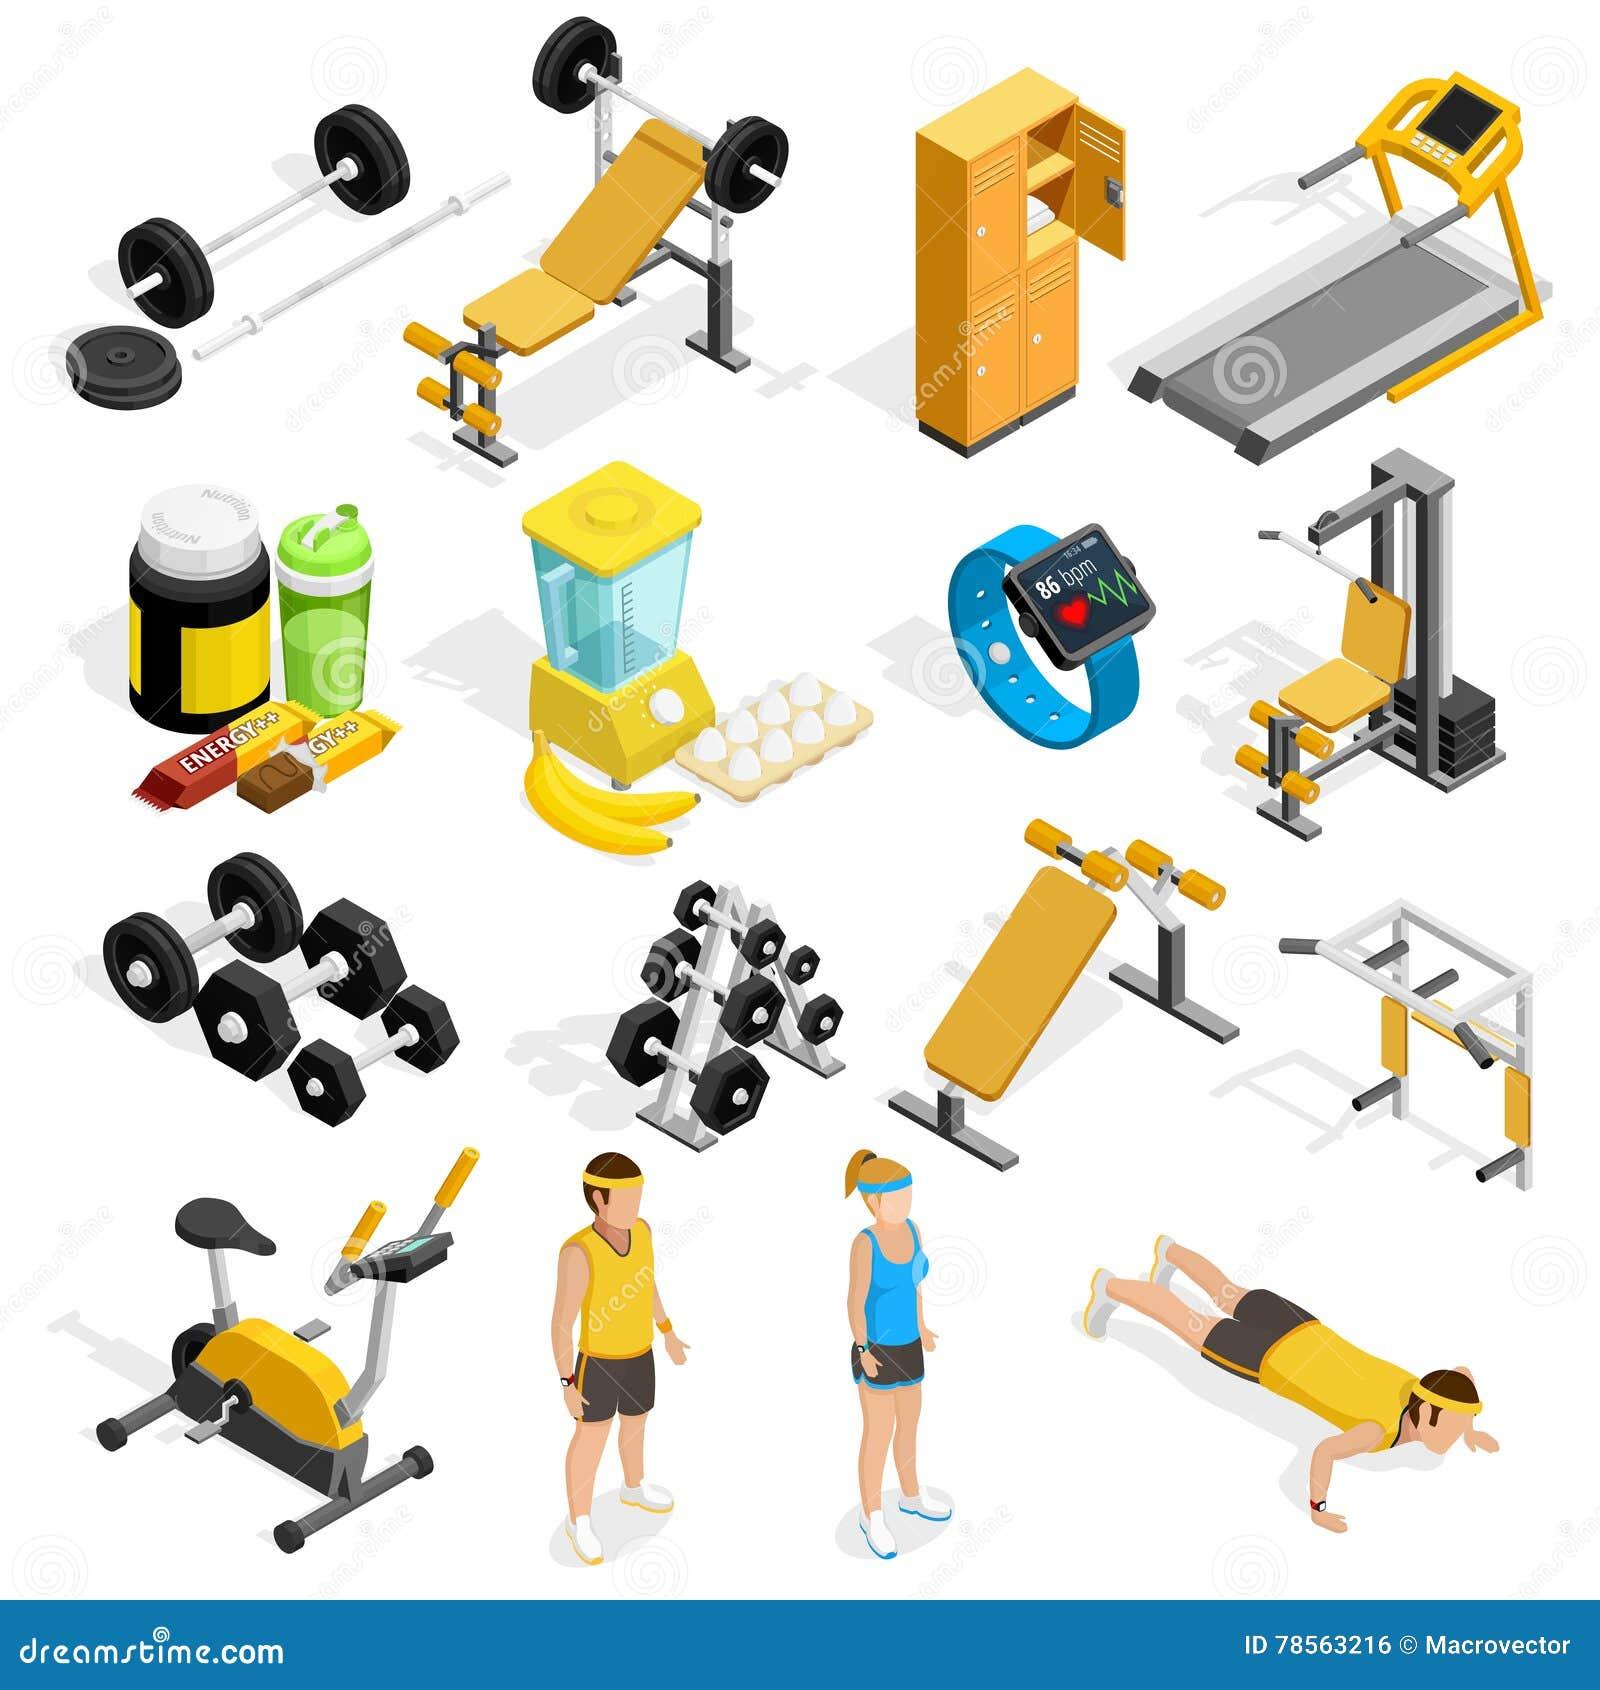 Isometric Training Equipment: Gym Equipment Isometric Vector Illustration Cartoon Vector